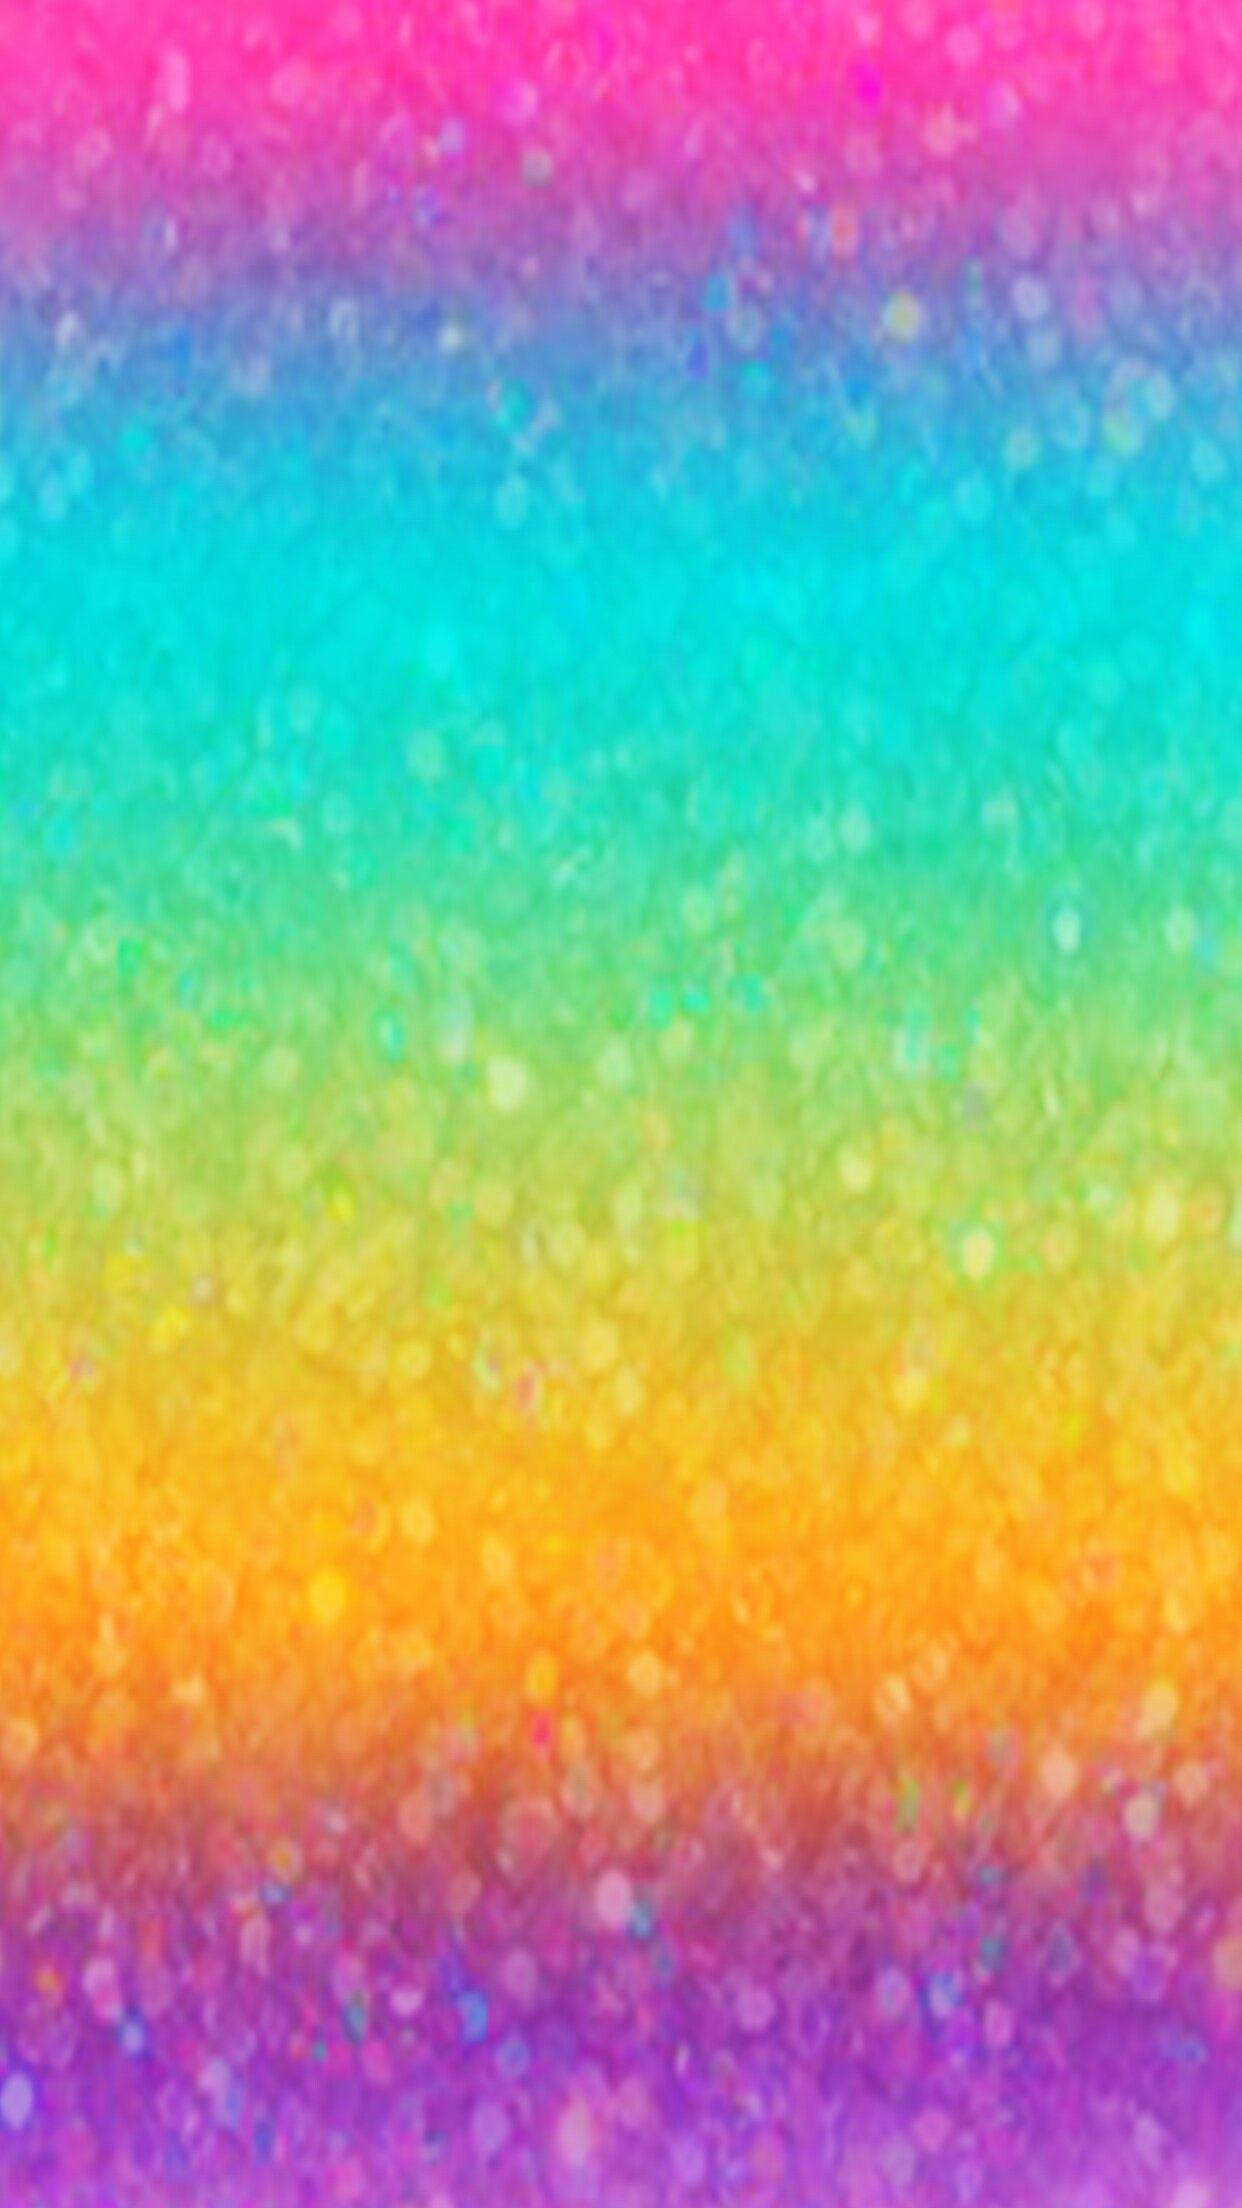 Glitter Wallpaper Image By Jennifer Jordan On Wallpaper Iphone